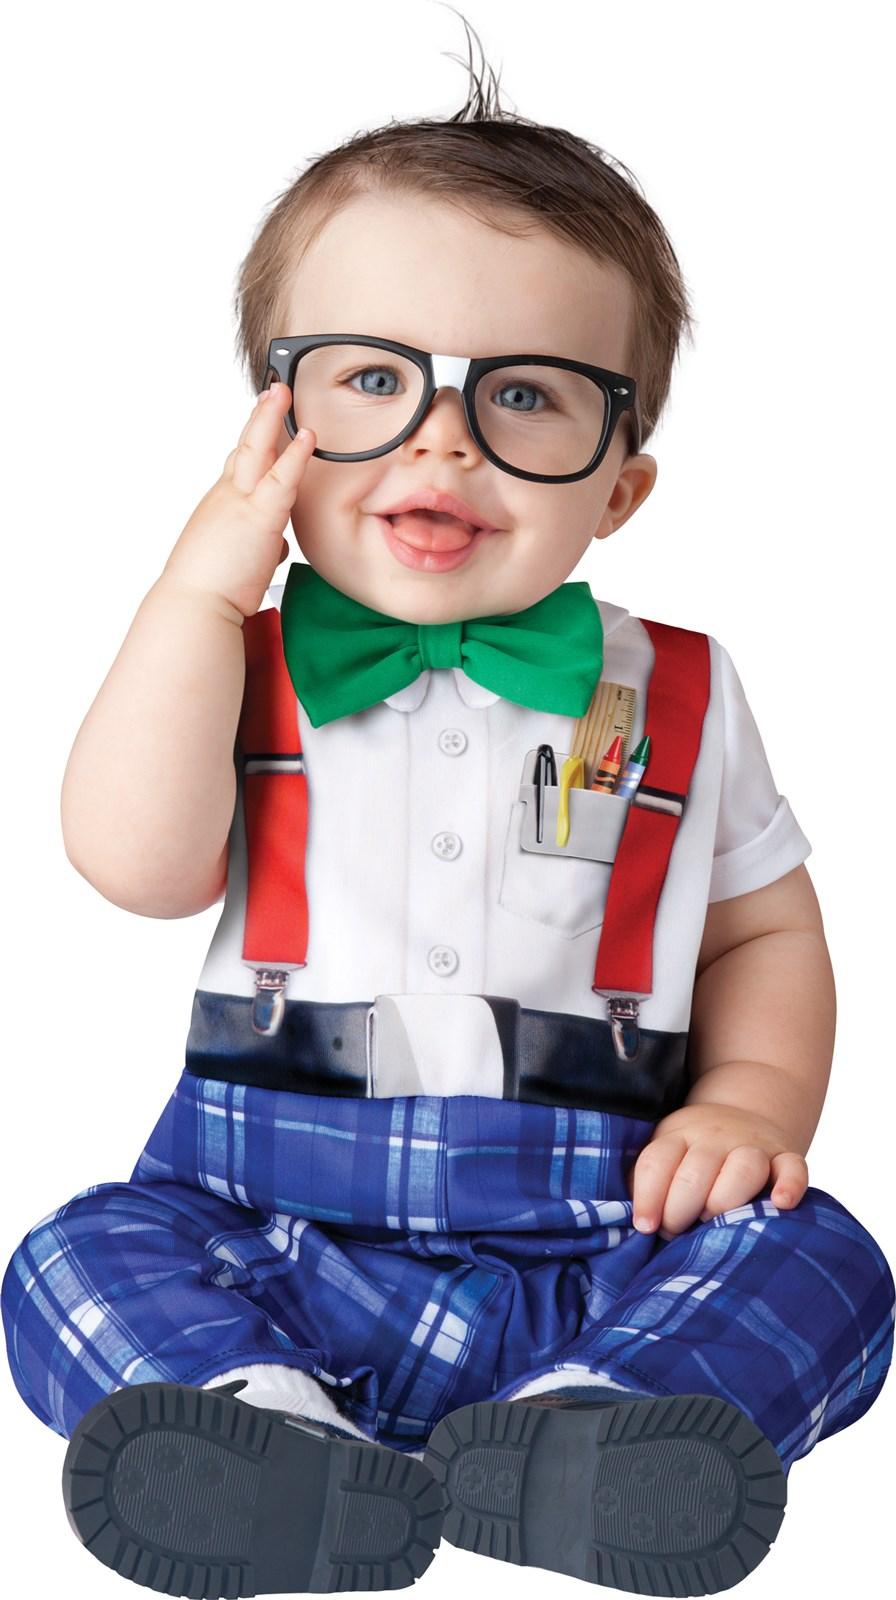 Toddler Nursery Nerd Costume